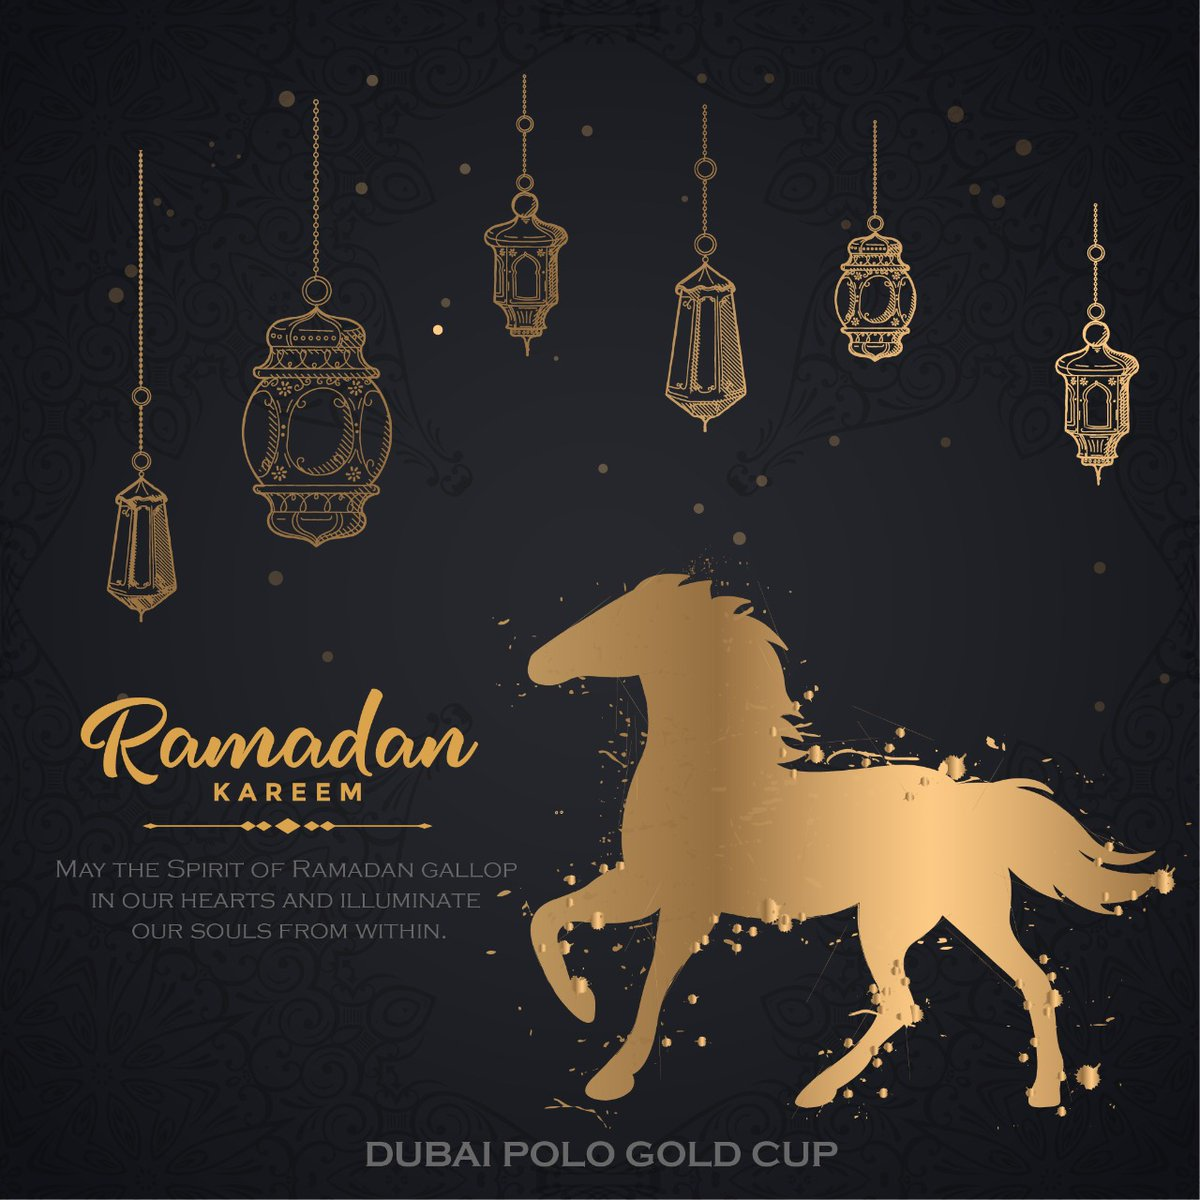 May the holy month of Ramadan bring you and loved ones closer in peace. Have a blessed Ramadan!  #StaySafeAtHome #StaySafe #Ramadan #Ramadan2020 #Iftar #Lifestyle #Dinners #Family #Friends #Dubai #MyDubai #LovinDubai #TimeoutDubai #DubaiCalendar #HolyMonth #WeAreInThisTogether https://t.co/xCZpdFShqy